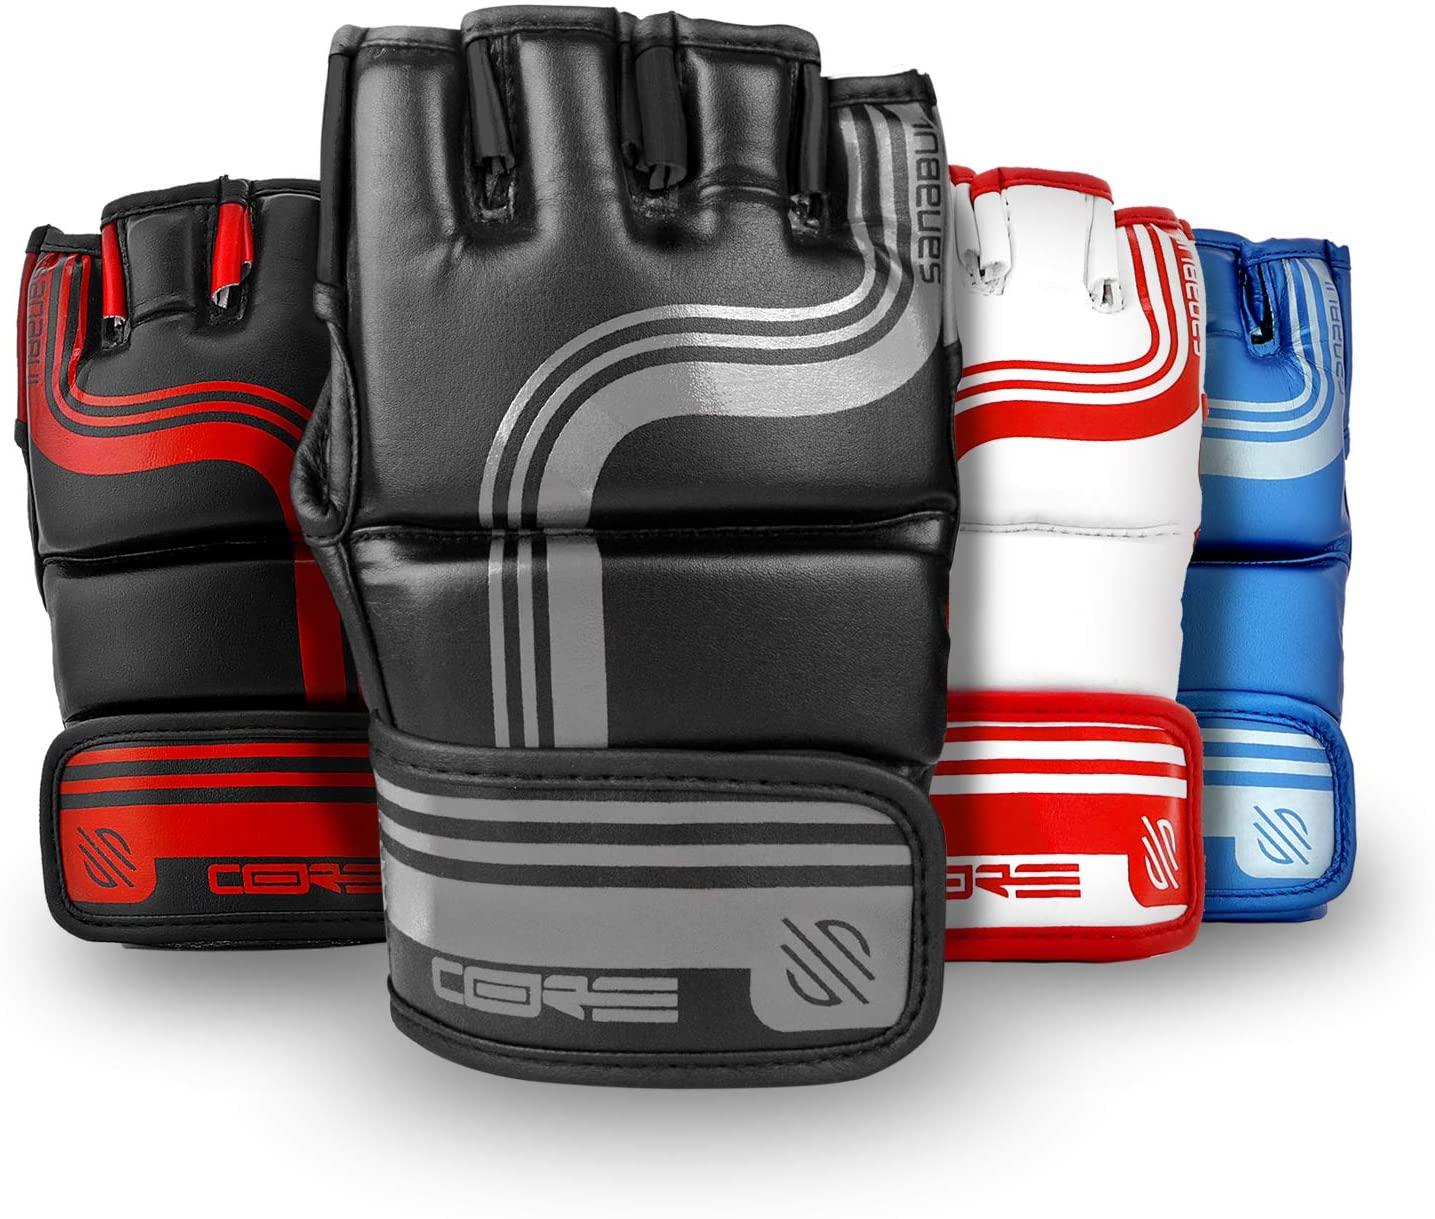 Sanabul Core Series 4 oz MMA Grappling Gloves